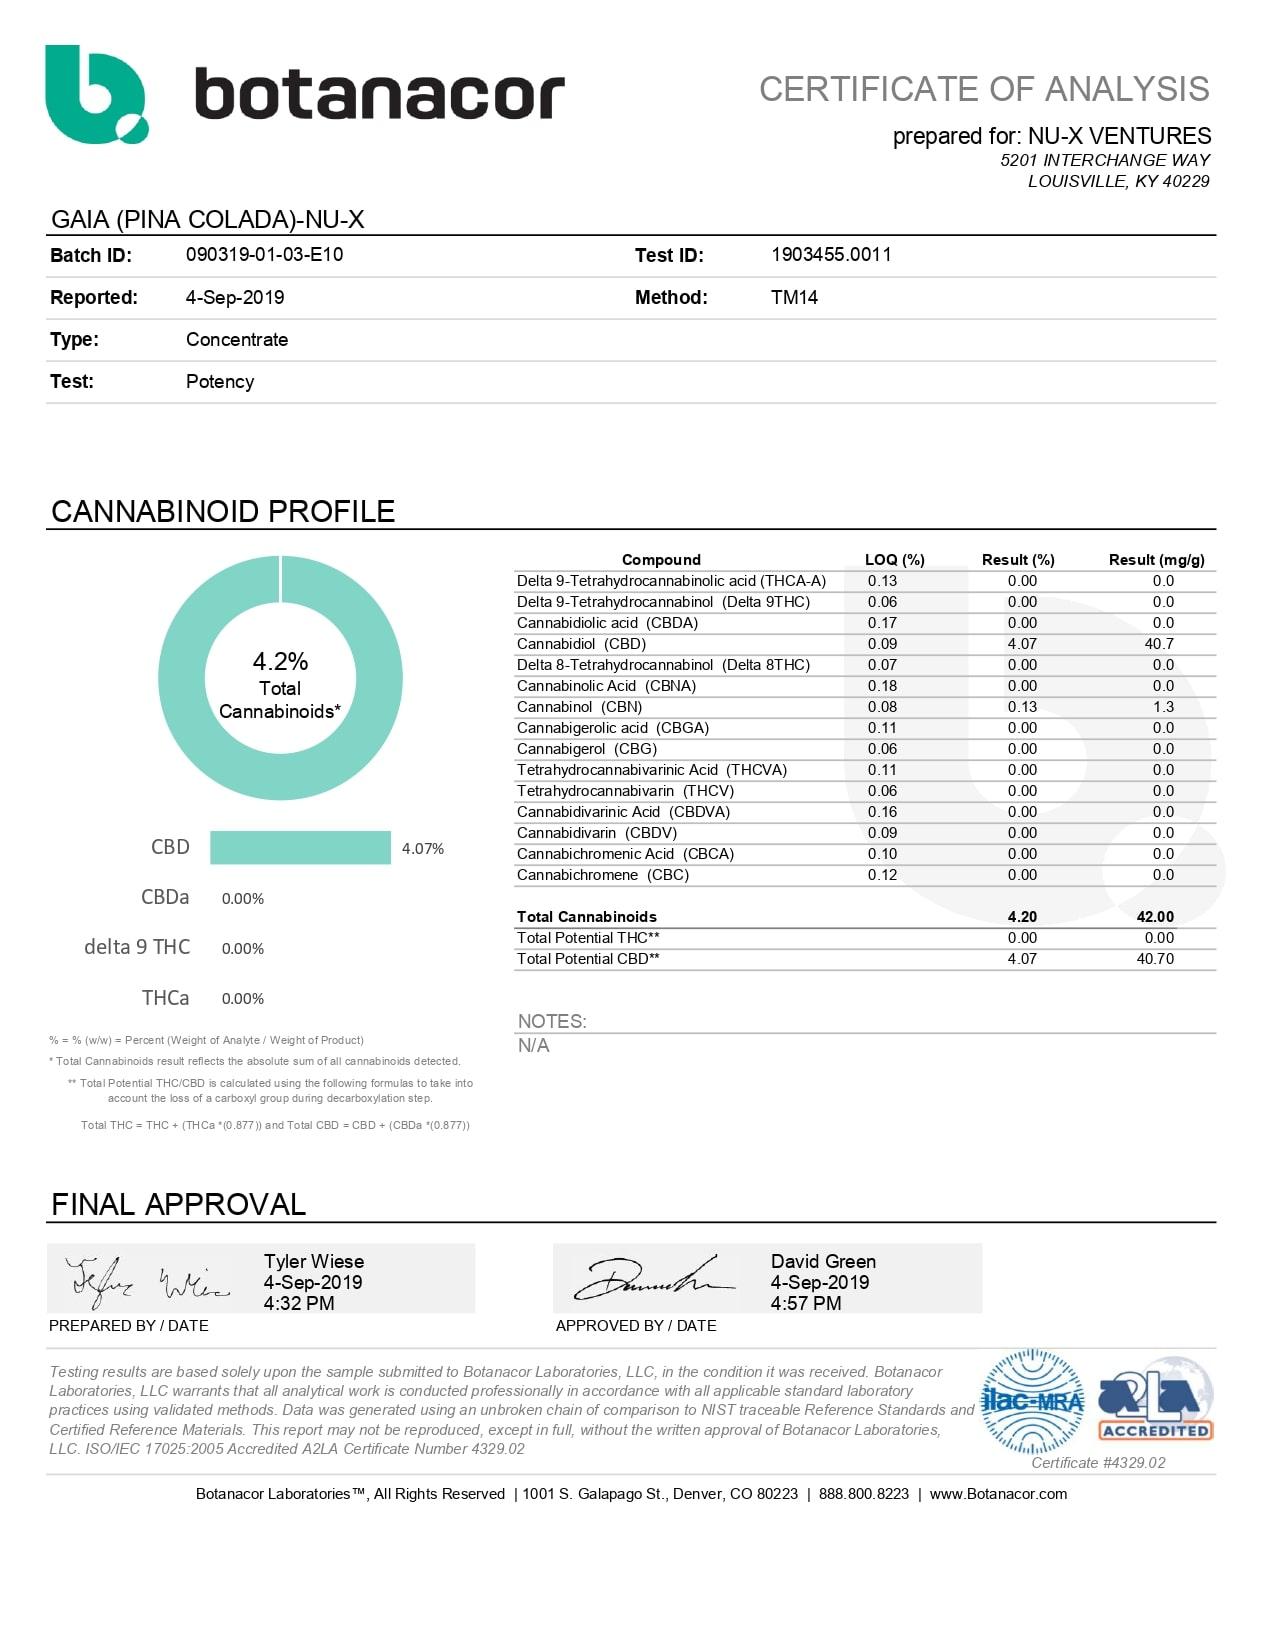 NU-X CBD Tincture Lab Report Gaia Pina Colada Coconut 1000mg